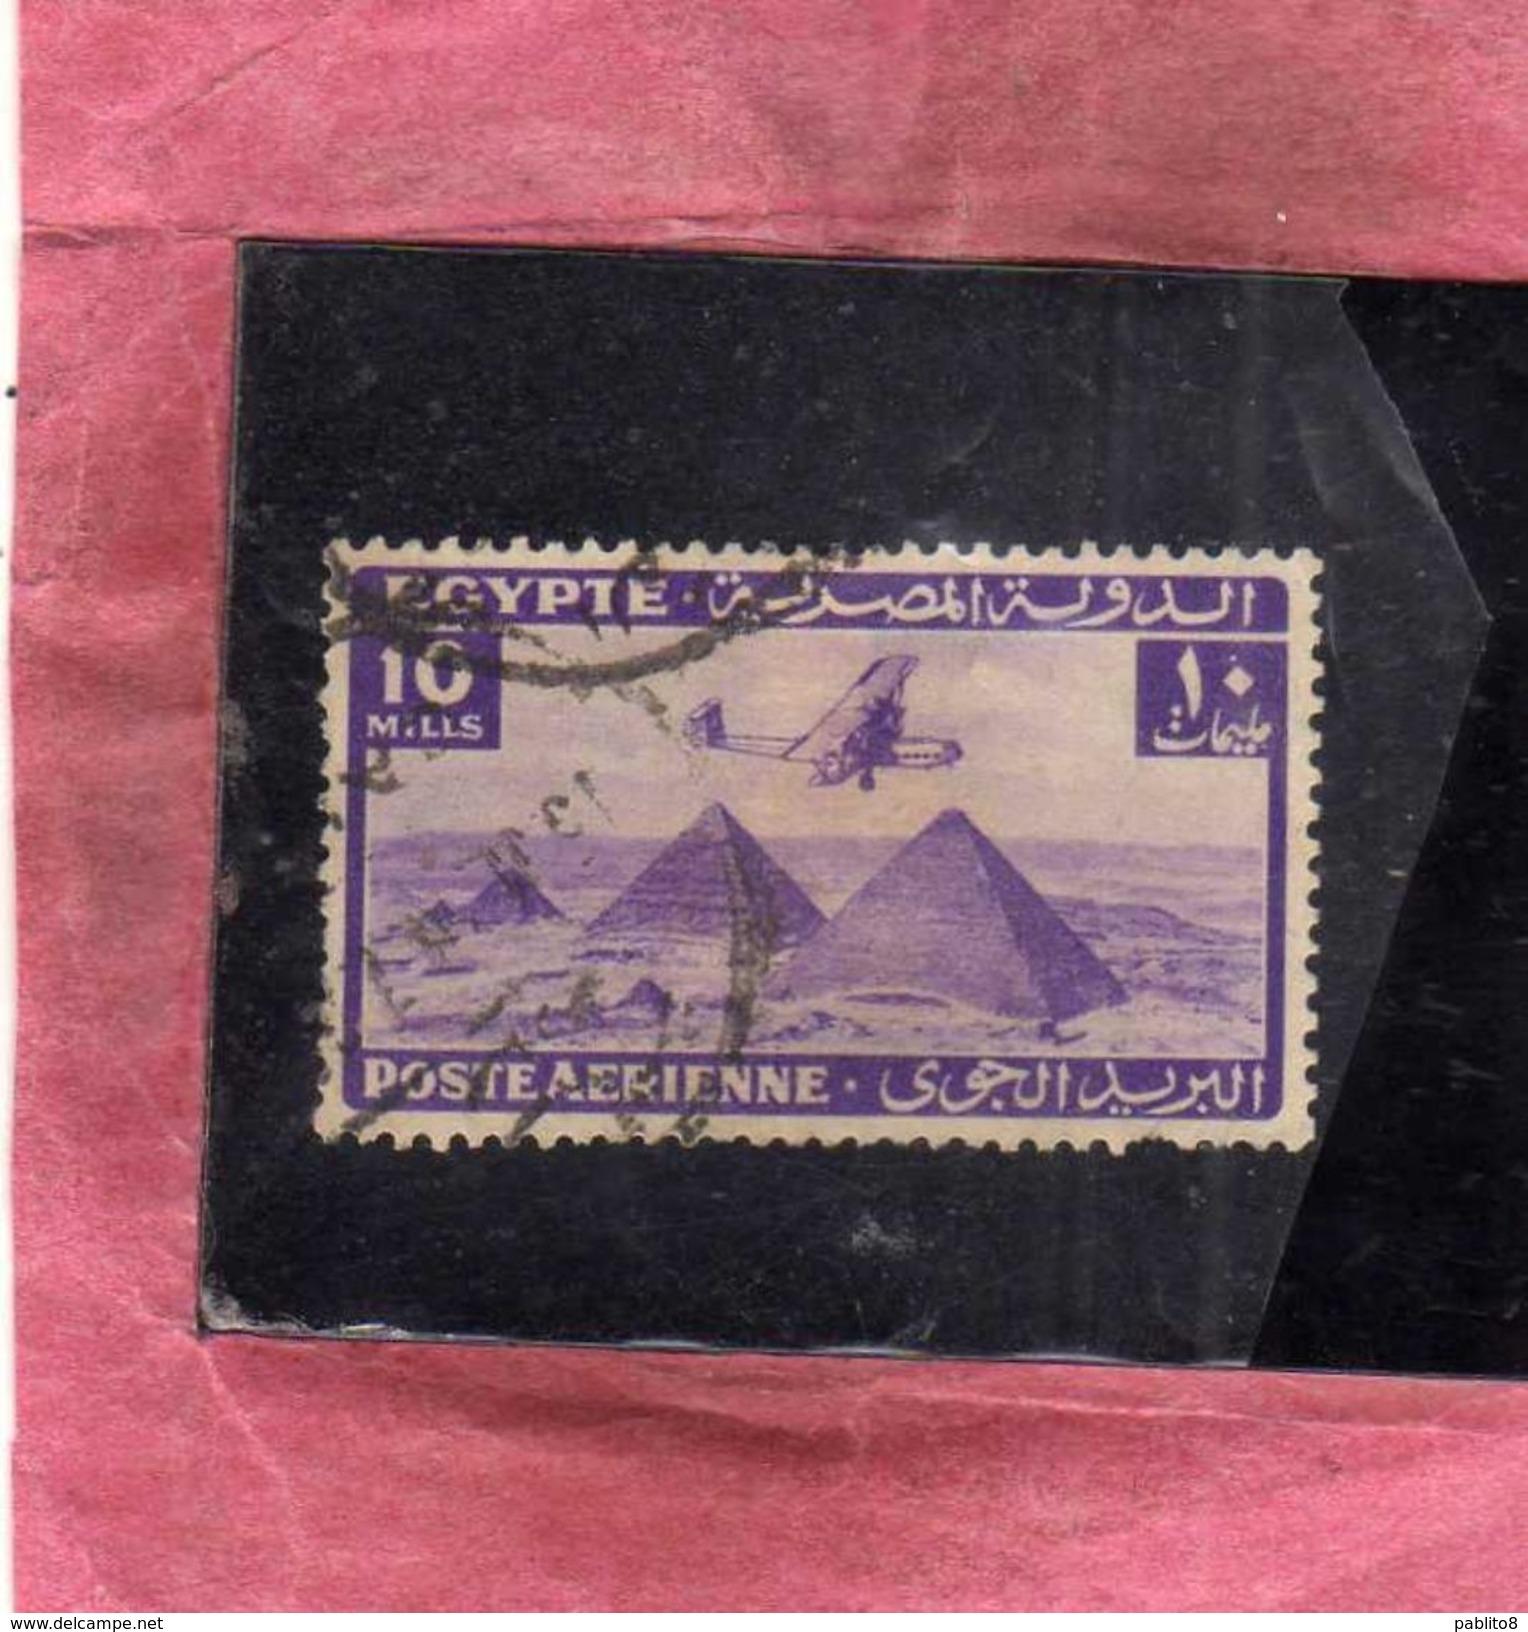 EGYPT EGITTO 1933 1938 AIR MAIL POSTA AEREA AIRPLANE OVER GIZA PYRAMIDS 10m USATO USED OBLITERE' - Posta Aerea